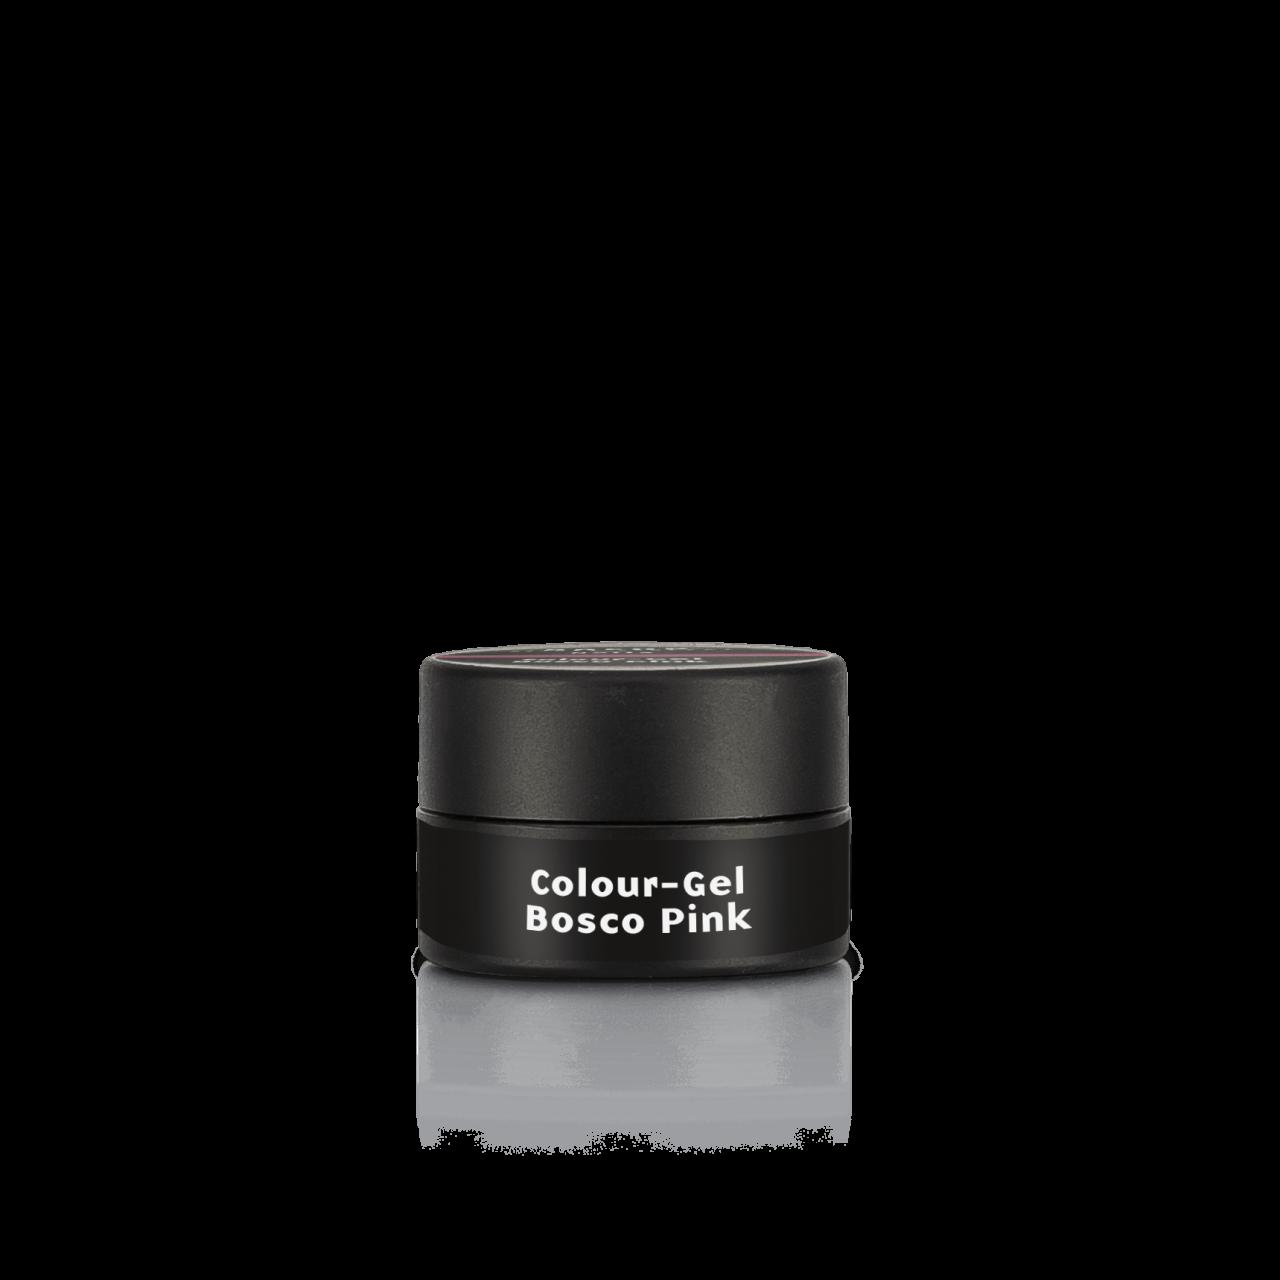 Colour-Gel Bosco Pink 5 ml